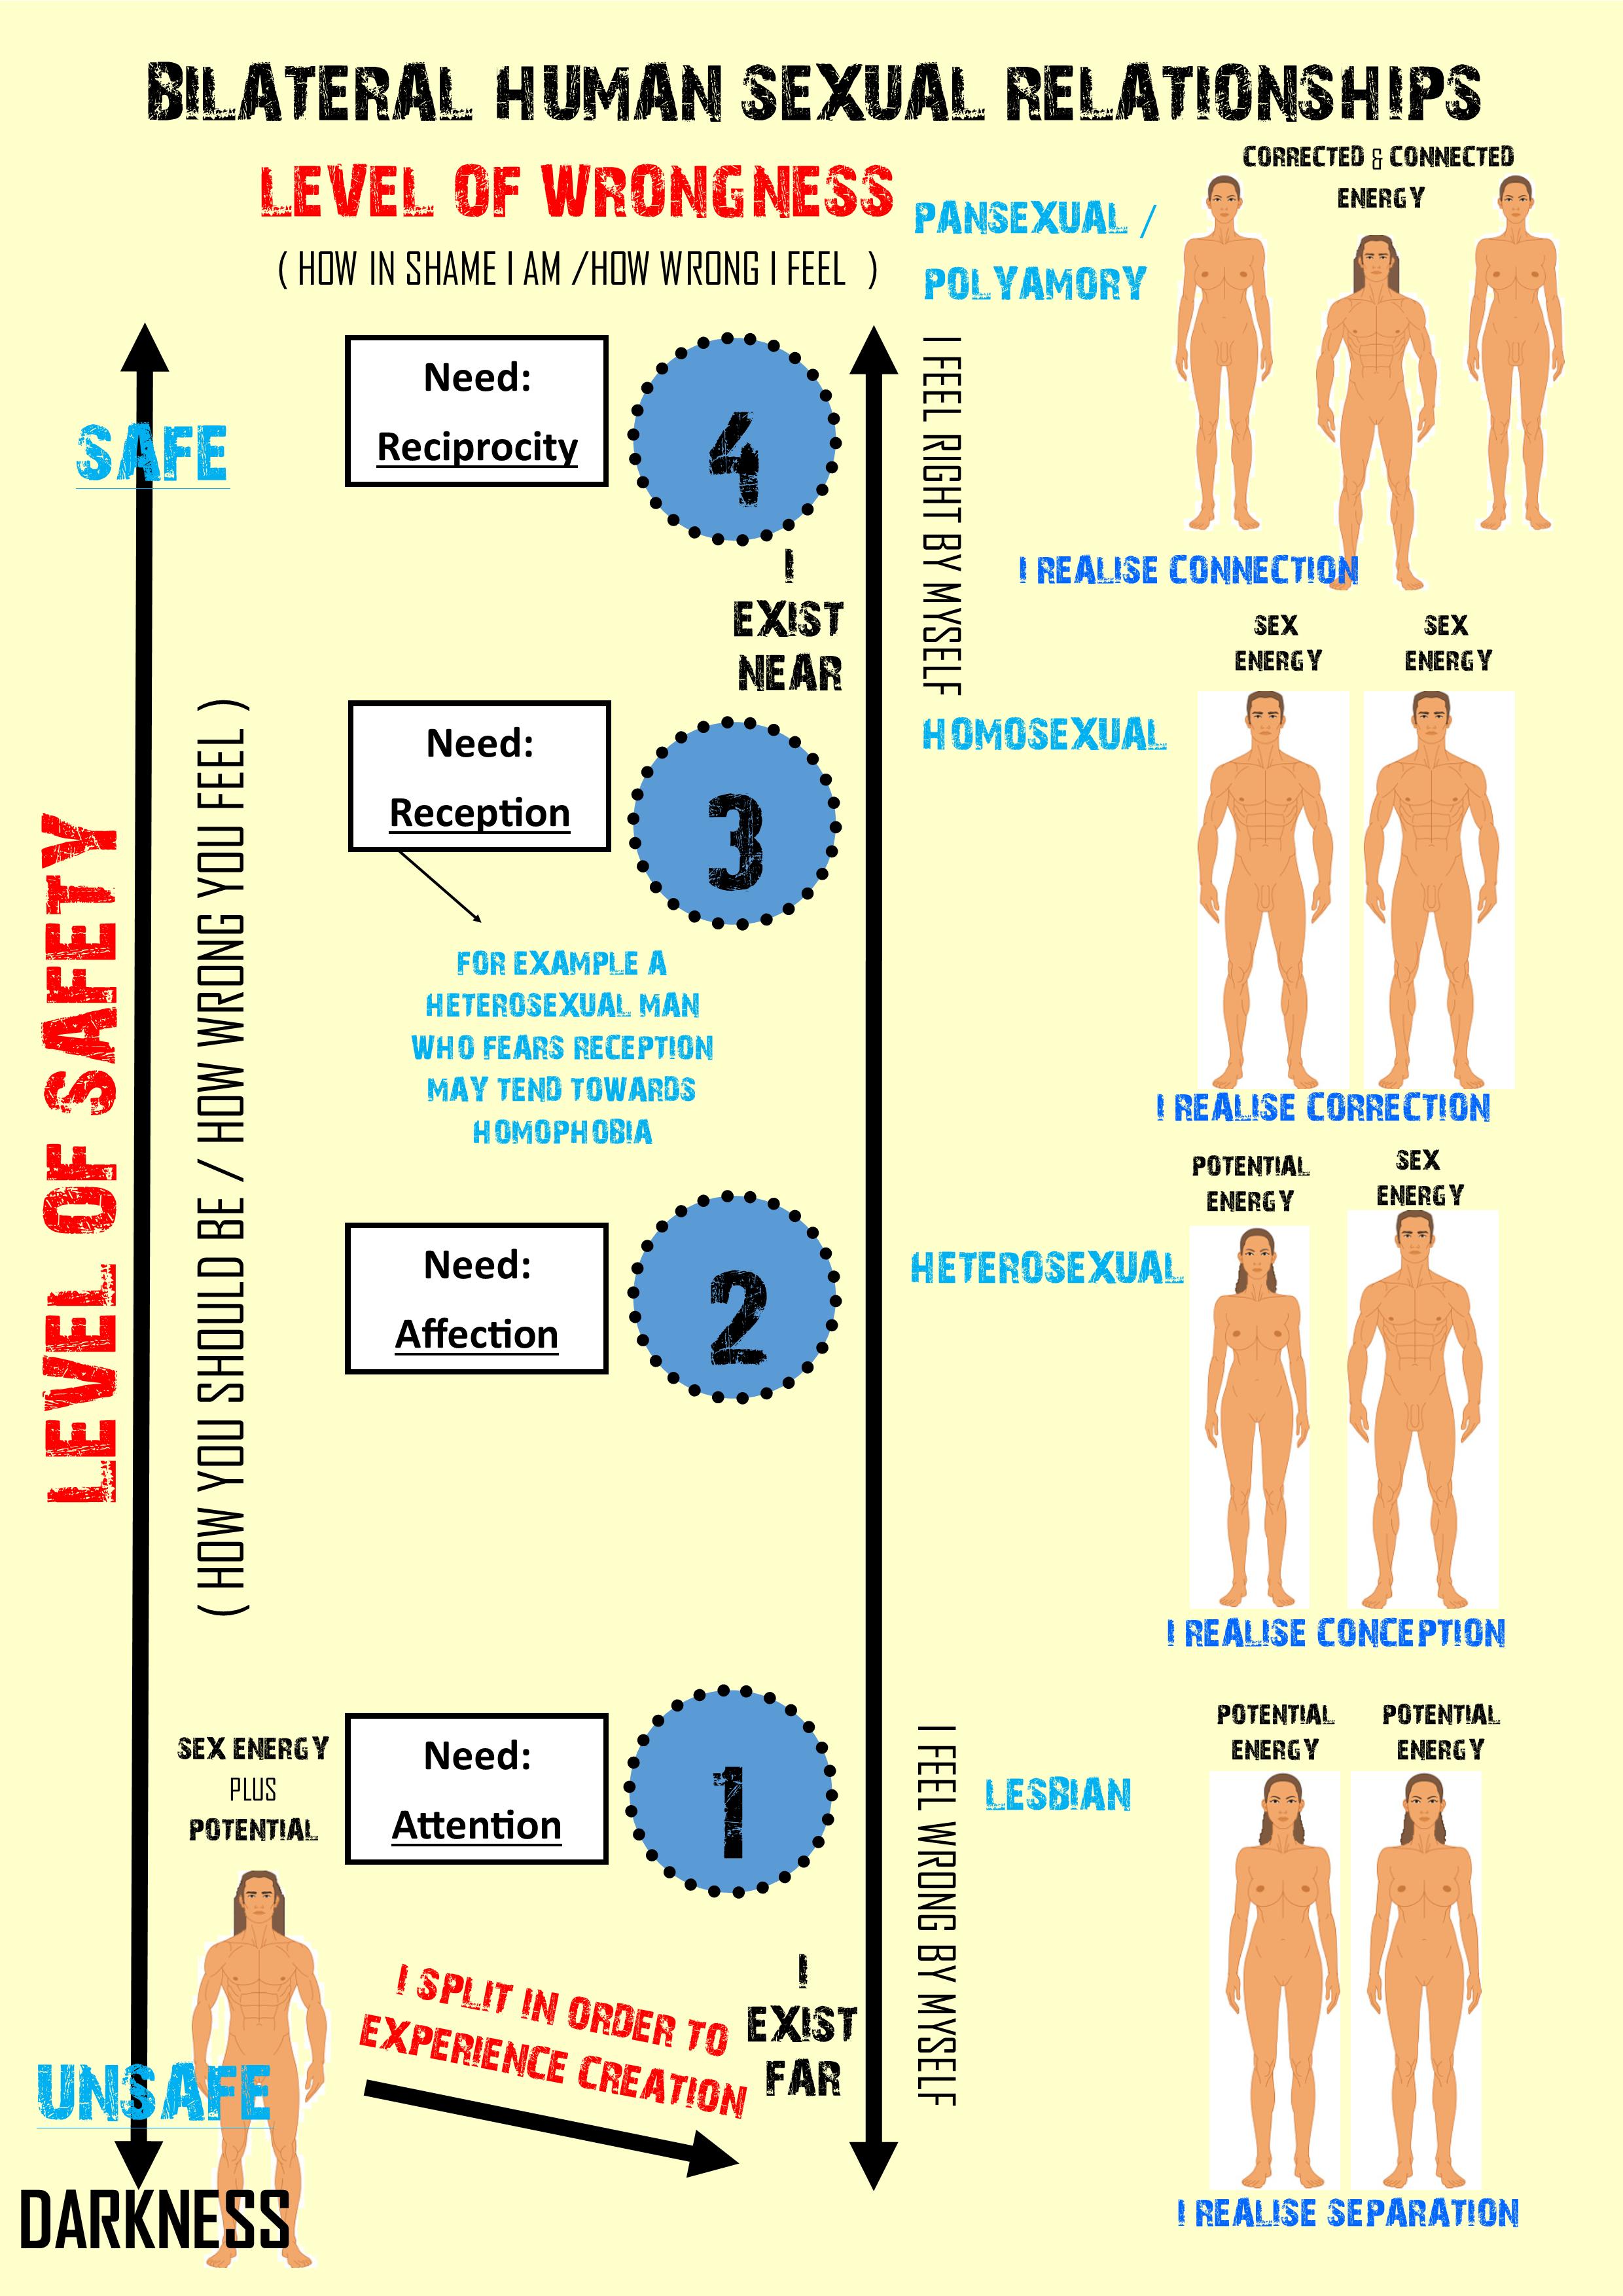 Bilateral Human Sexual Relations